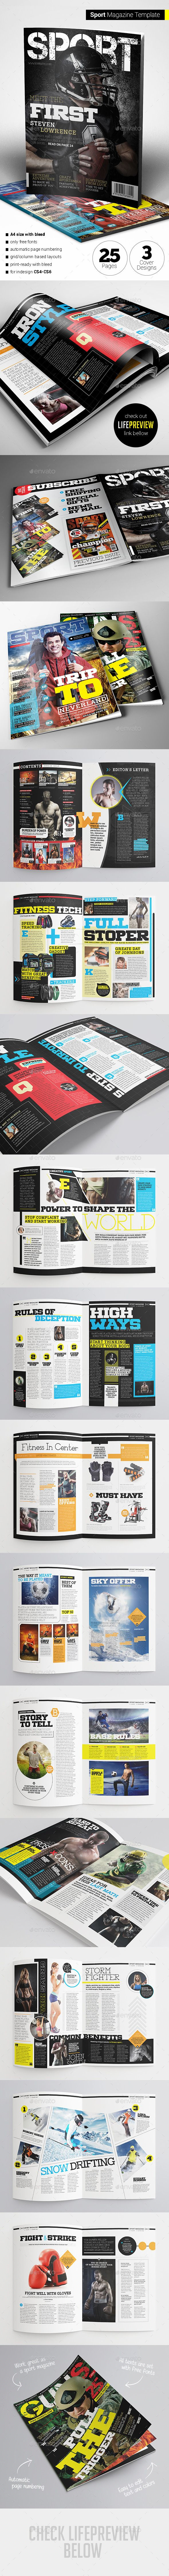 Sport Magazine | Sports magazine, Magazines and Template